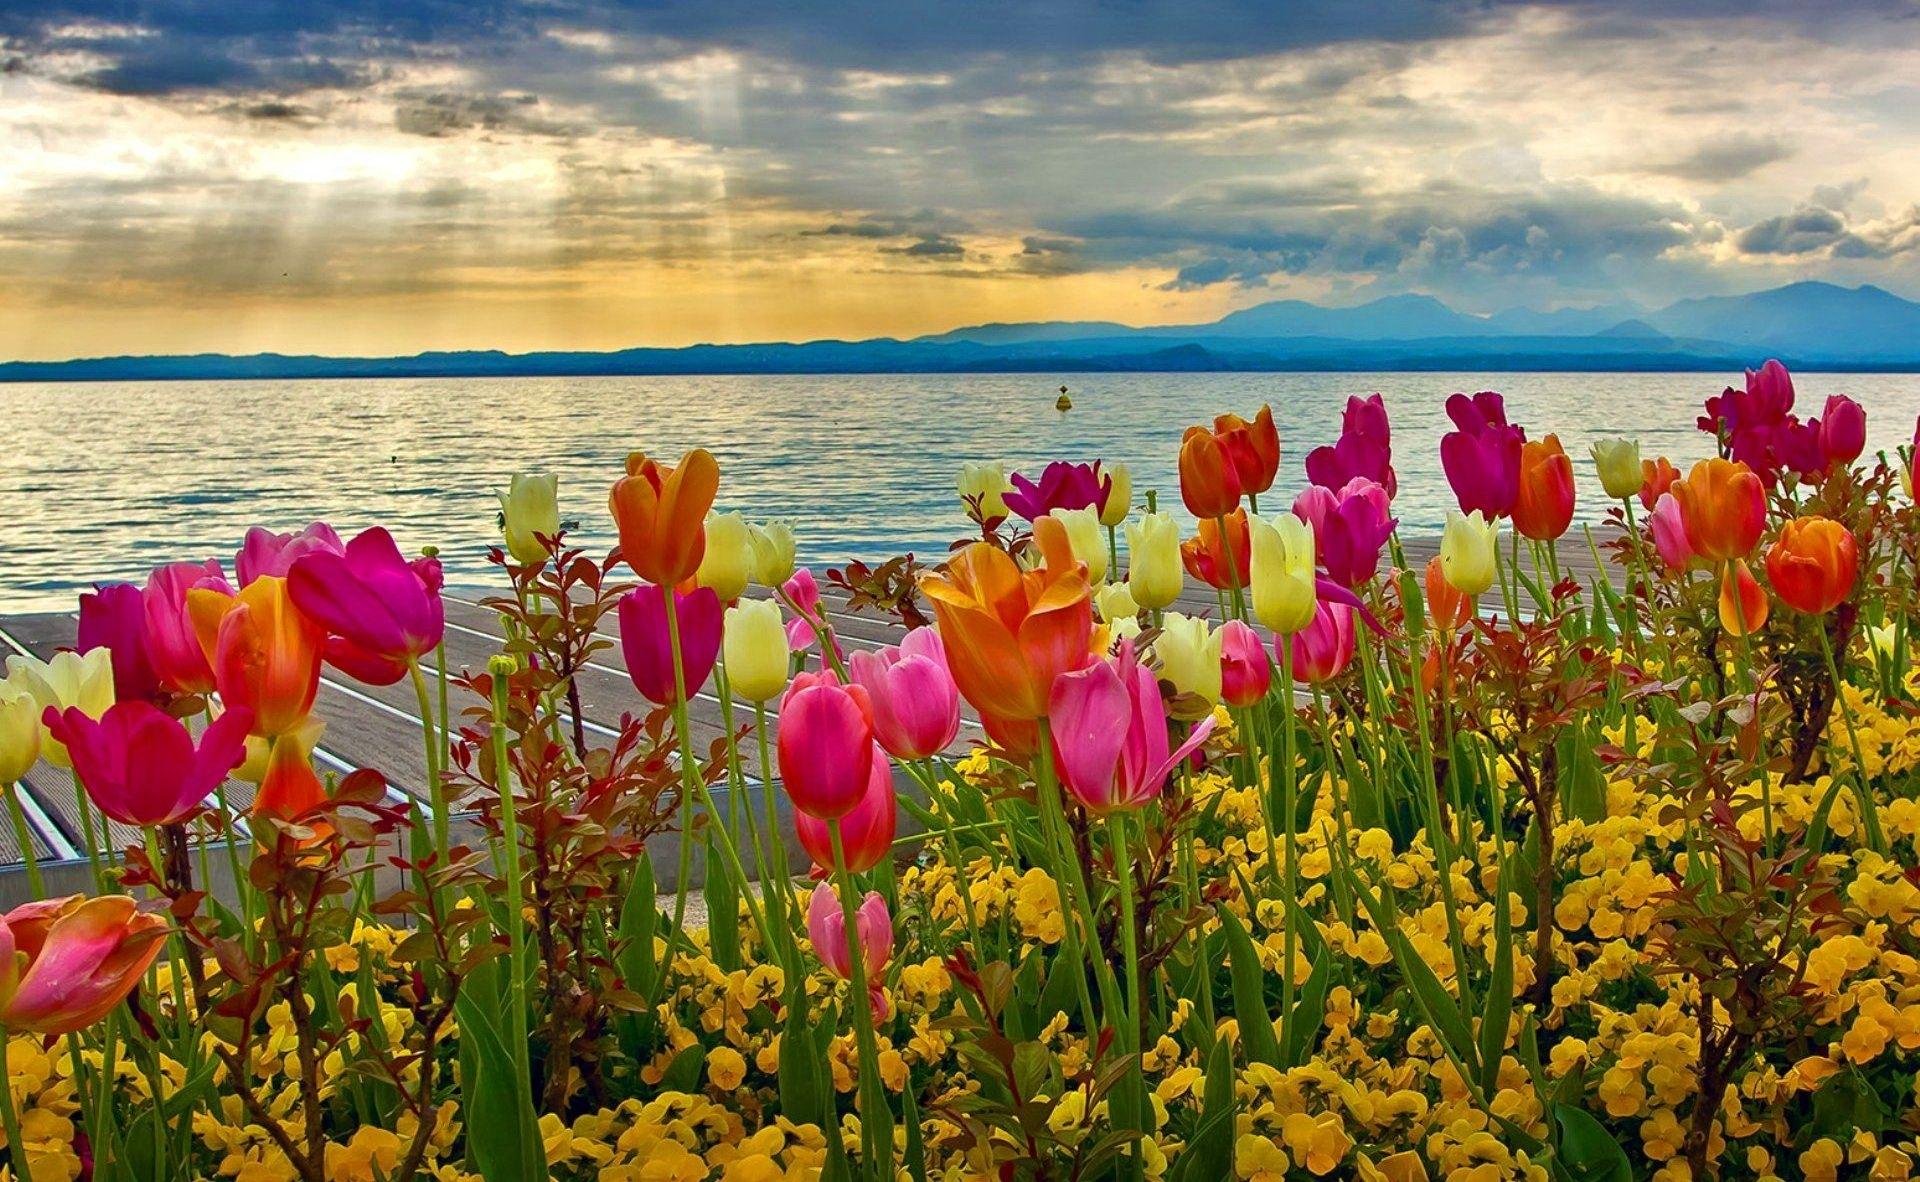 spring tulips | spring fever/ storms/ flowers | pinterest | lake